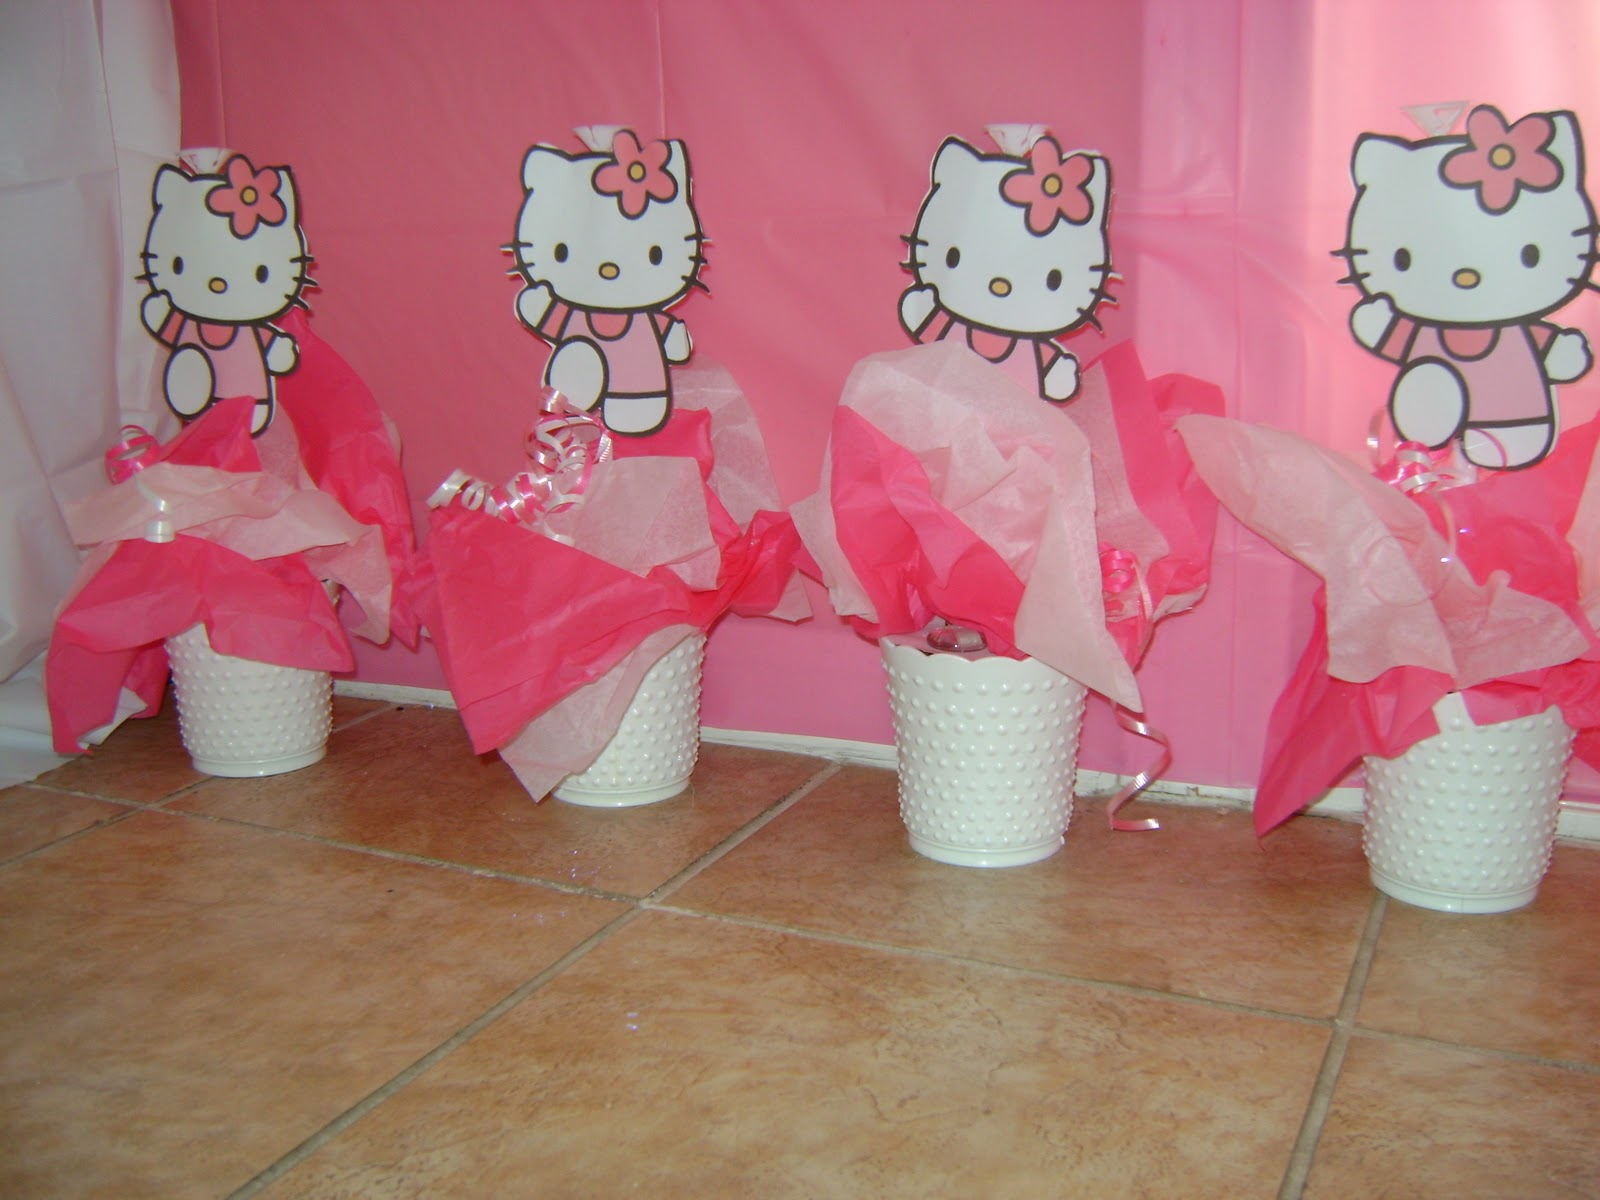 Handmade Hello Kitty Center Table Decorations Photograph  H